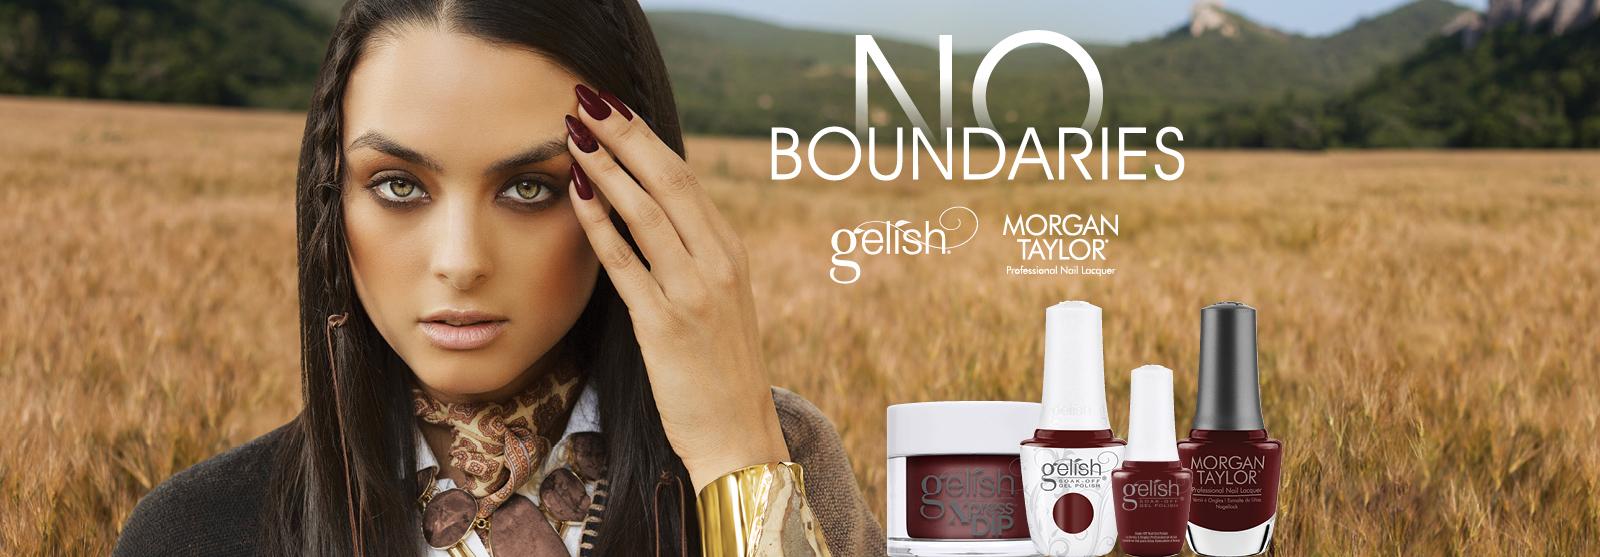 No Boundaries - Collection Fall 2021